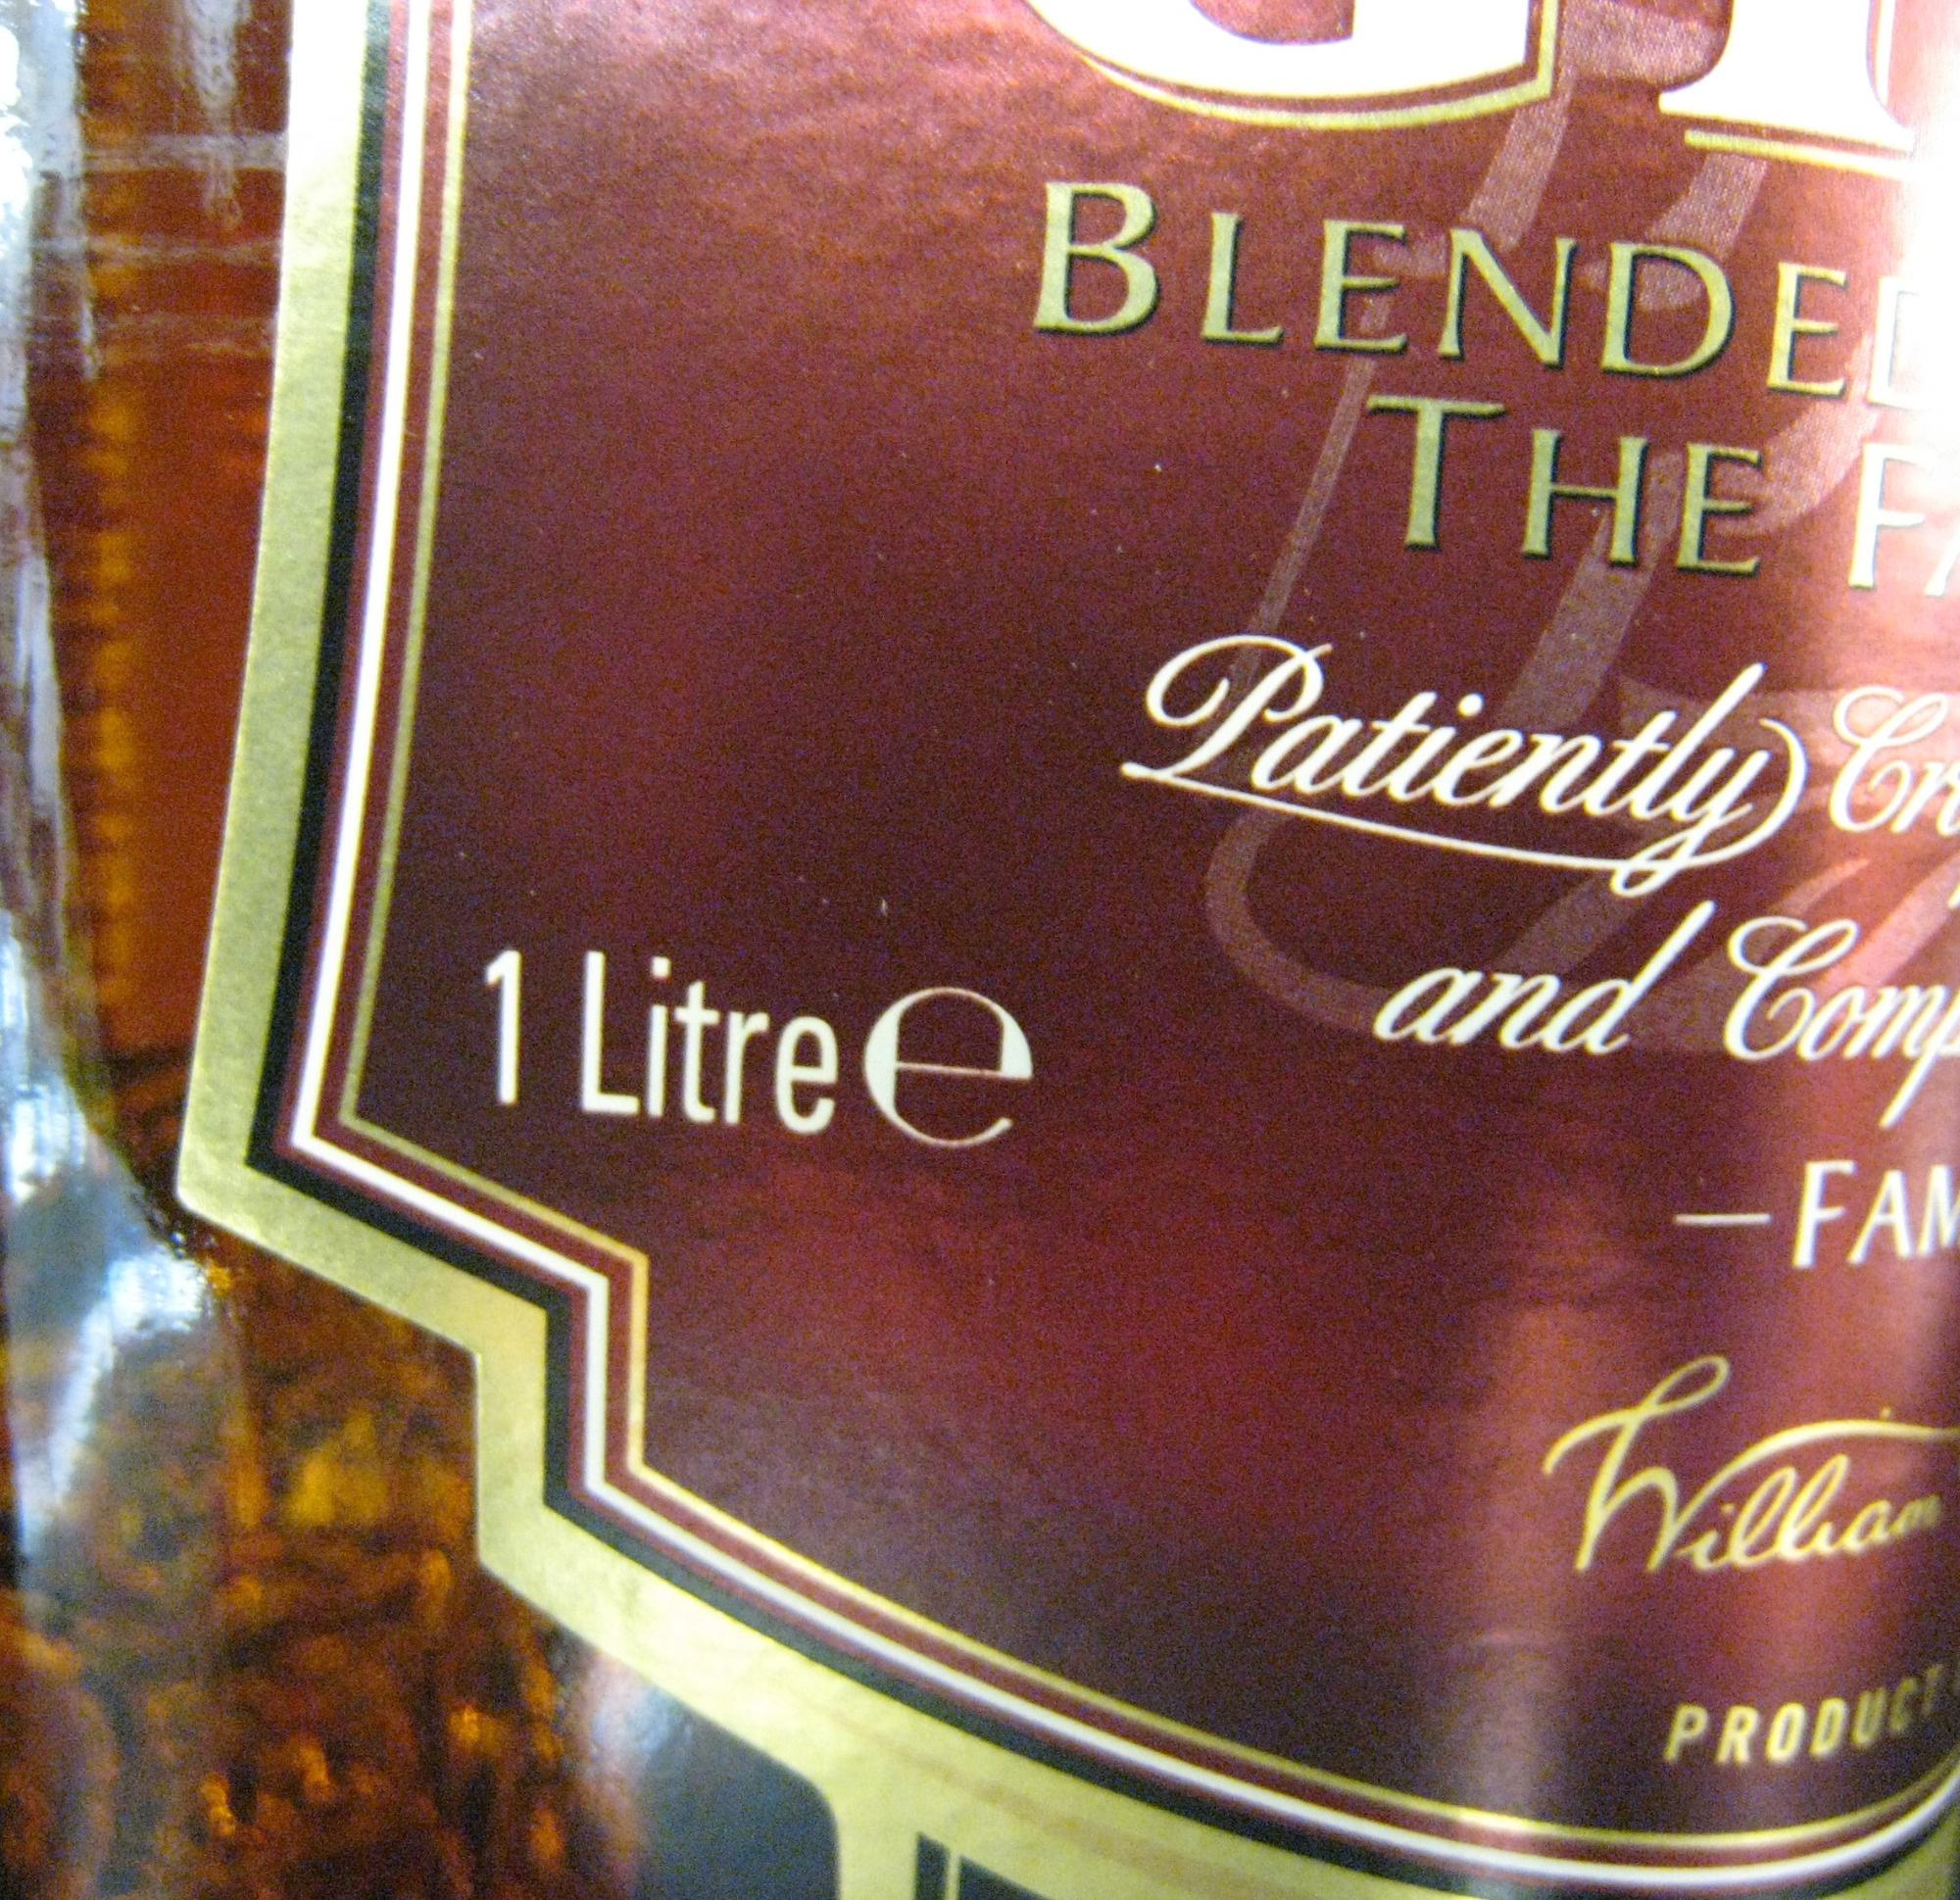 Whisky Ecosse blended sans âge 100 cl Grant's - Ingrediënten